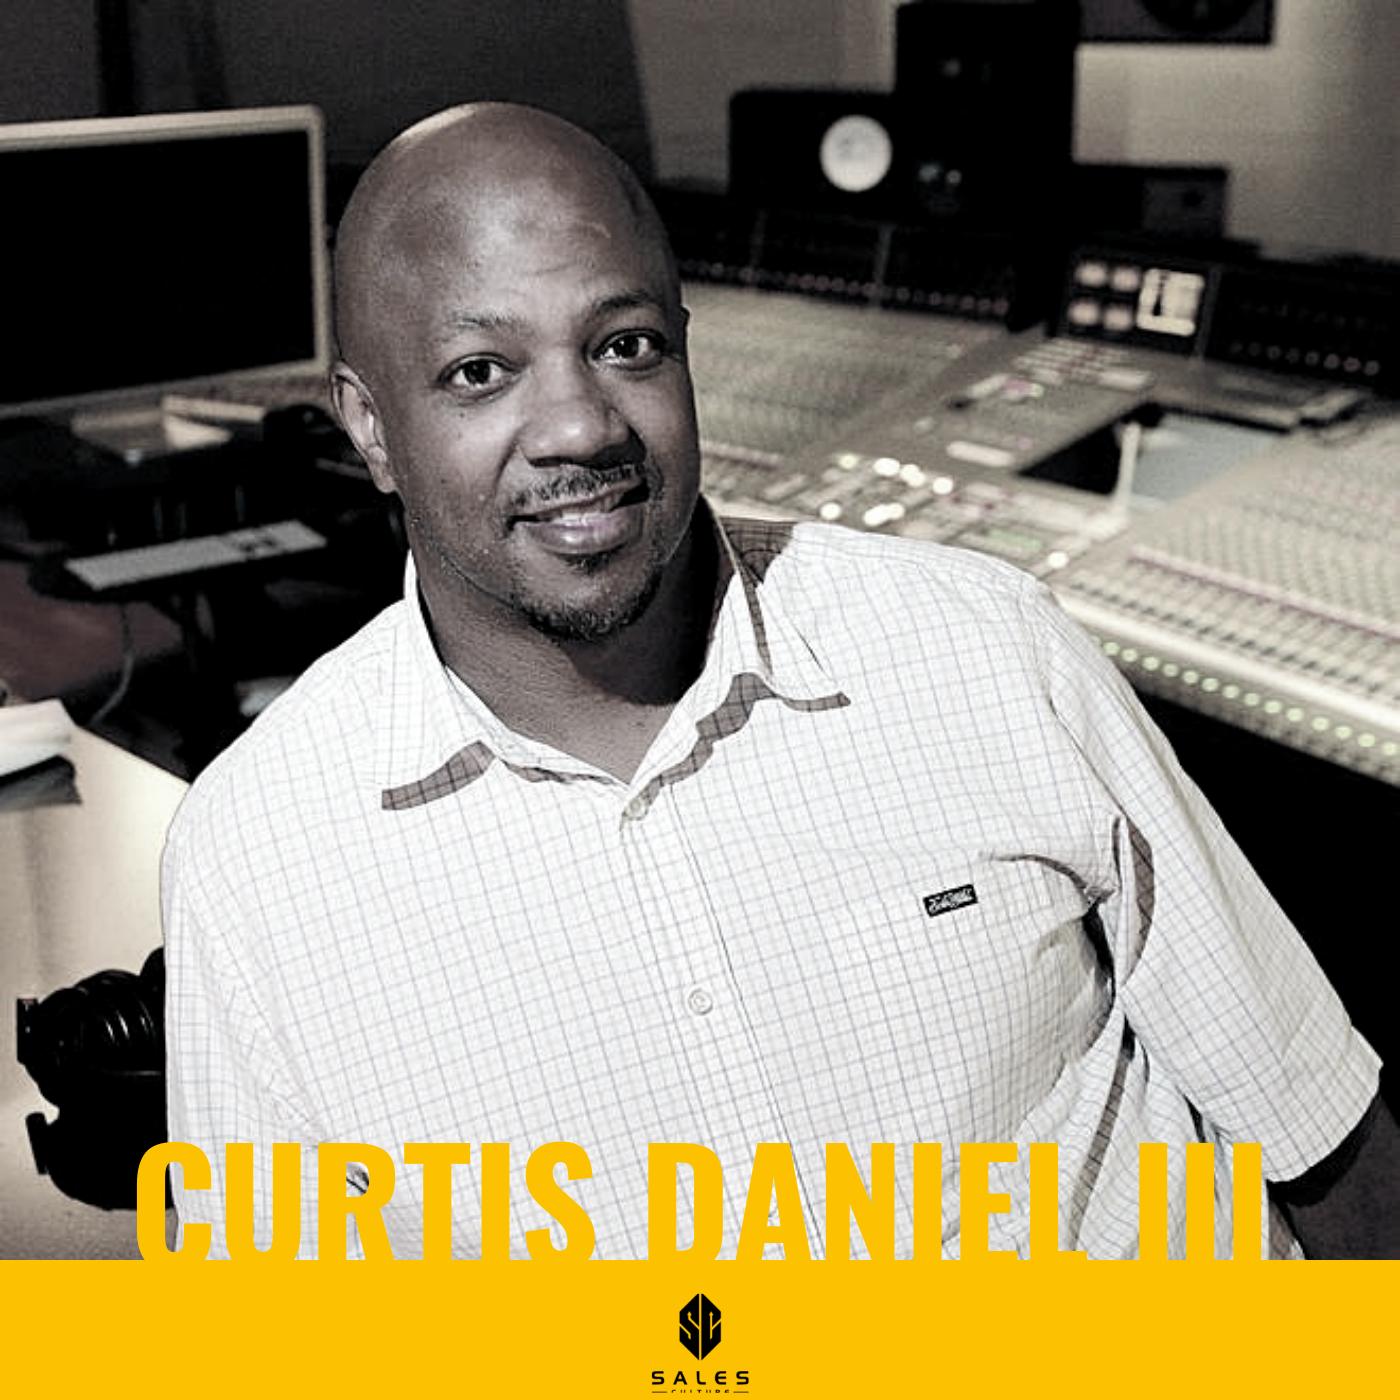 Curtis Daniel III ARTWORK.png